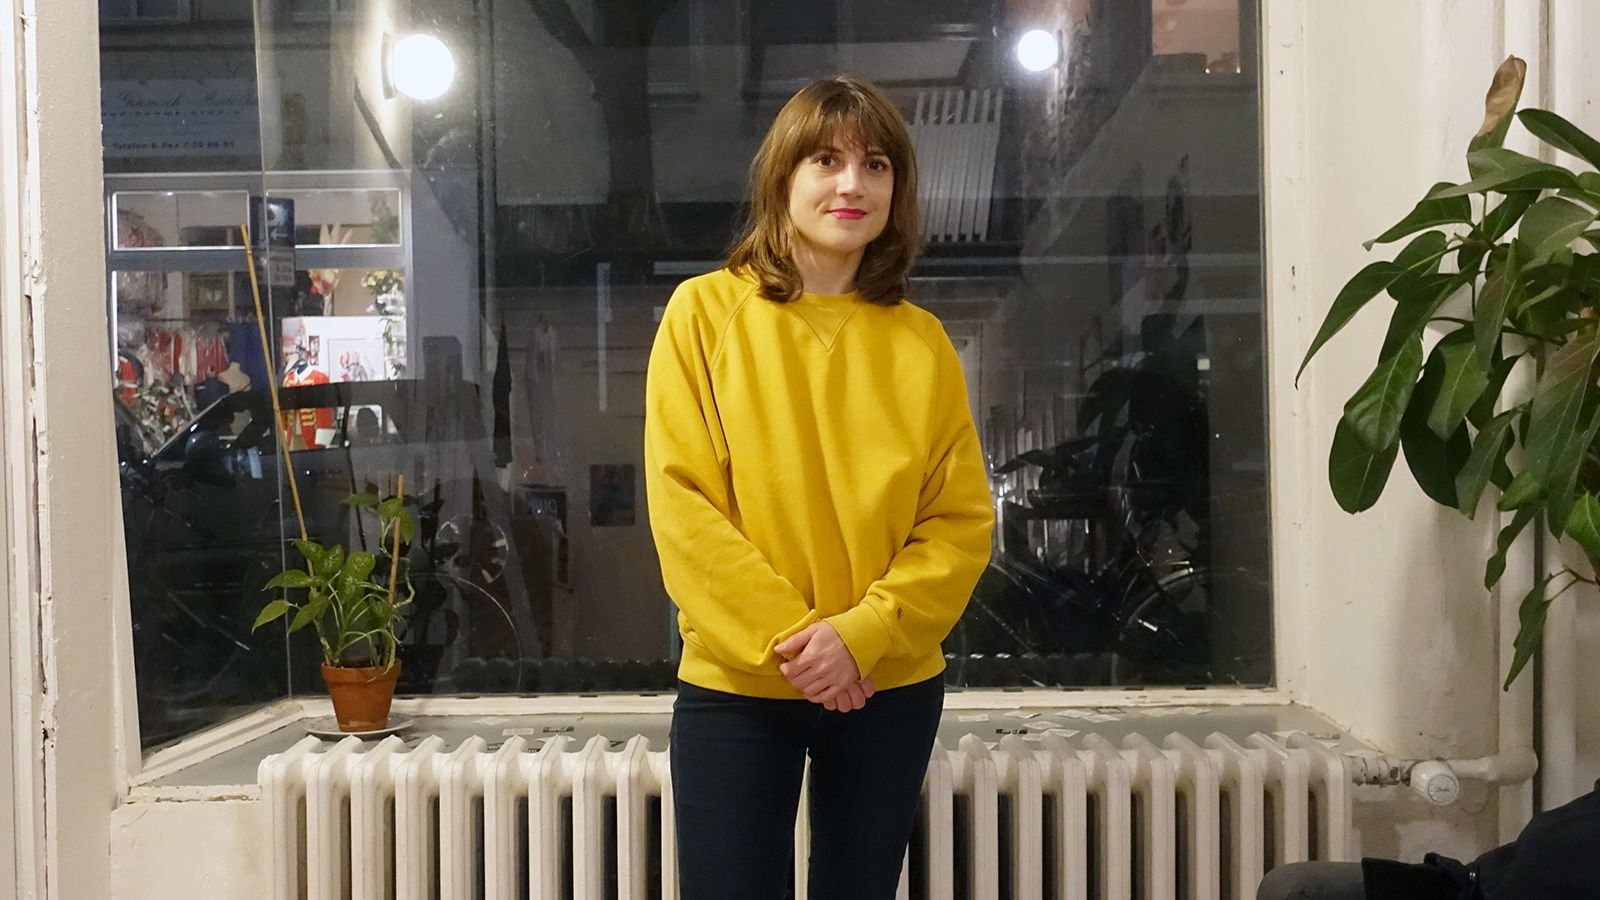 Ksdhfjkdhfkhw w/ Ana Helder (February 2021)